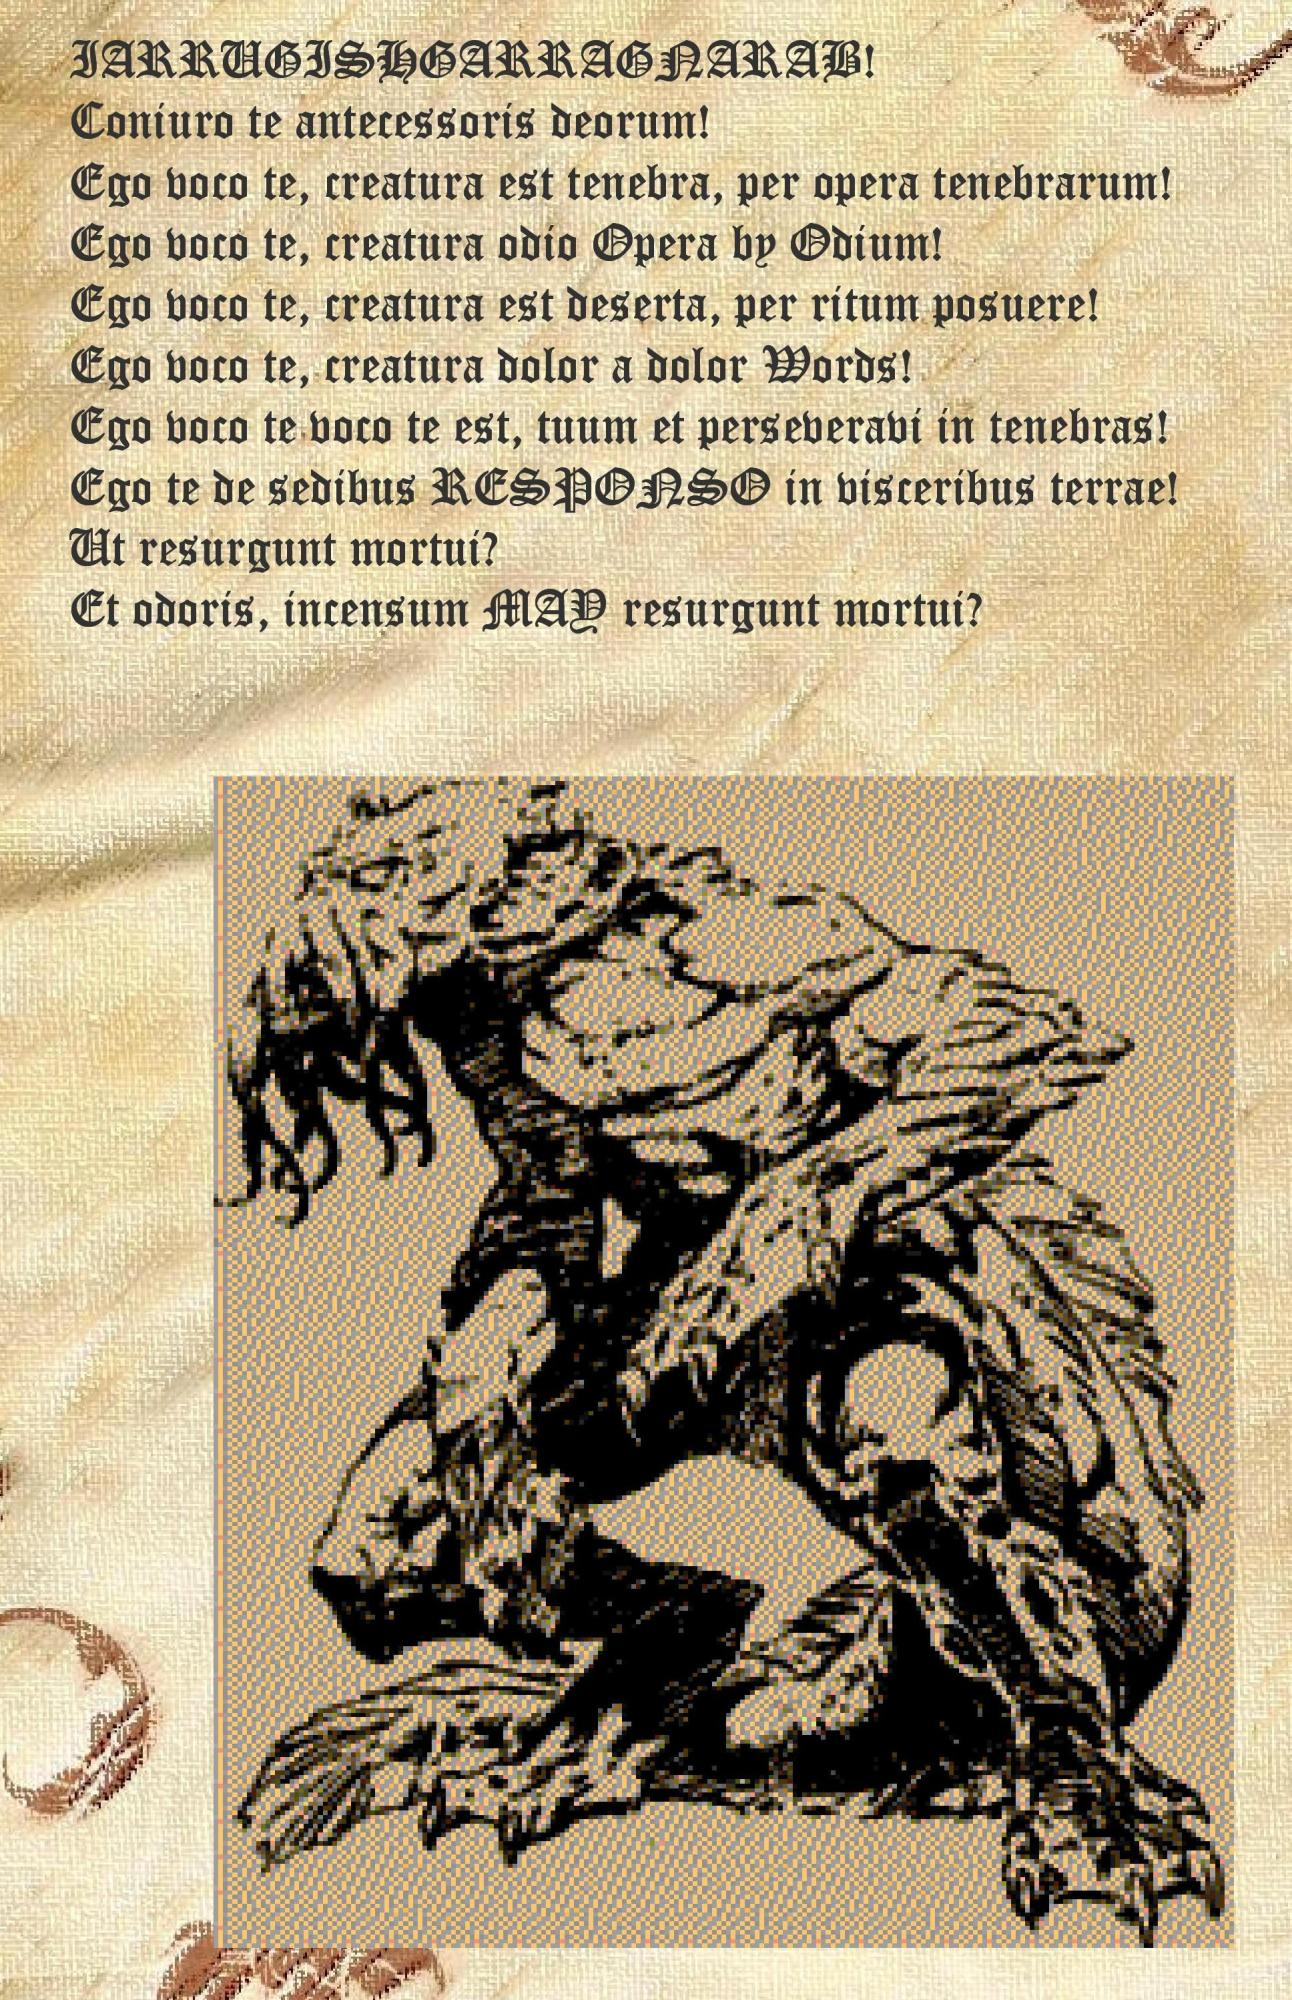 Dark spell page 002